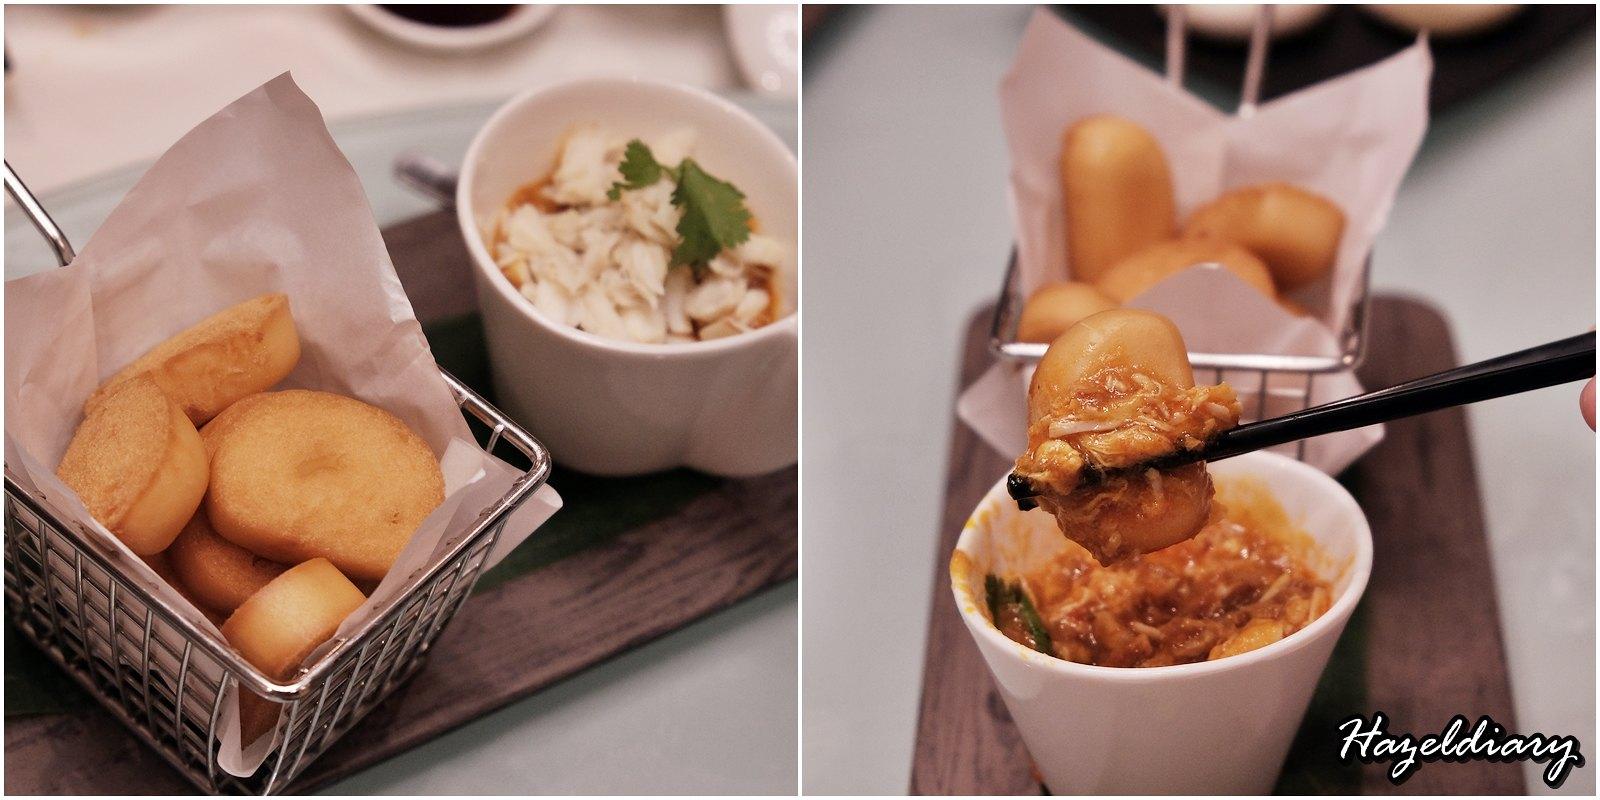 Jumbo Seafood Ion Orchard restaurant-Chilli crab dim sum